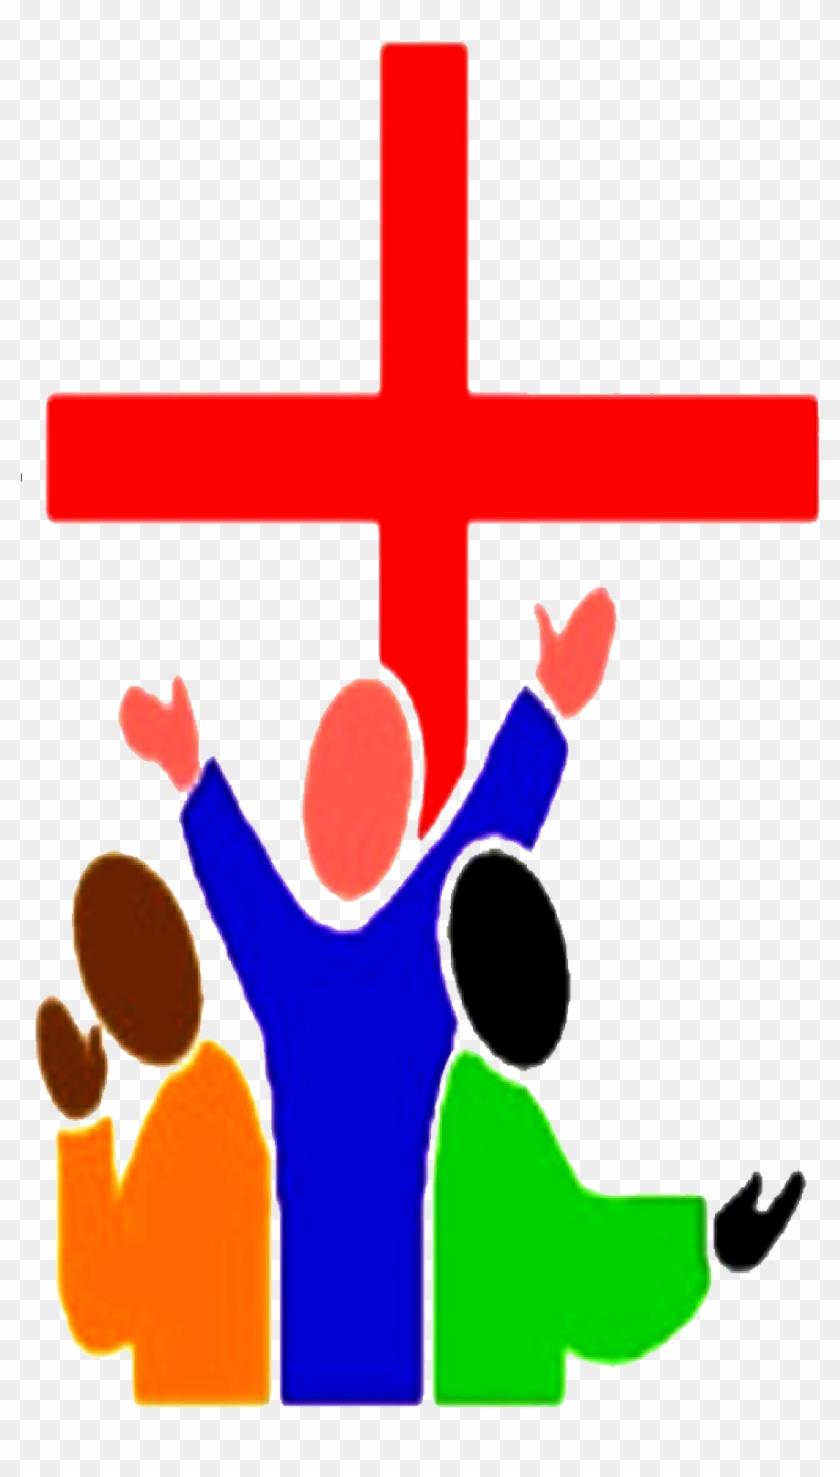 Harborne Baptist Church - Family At Church Transparent Clipart #10823